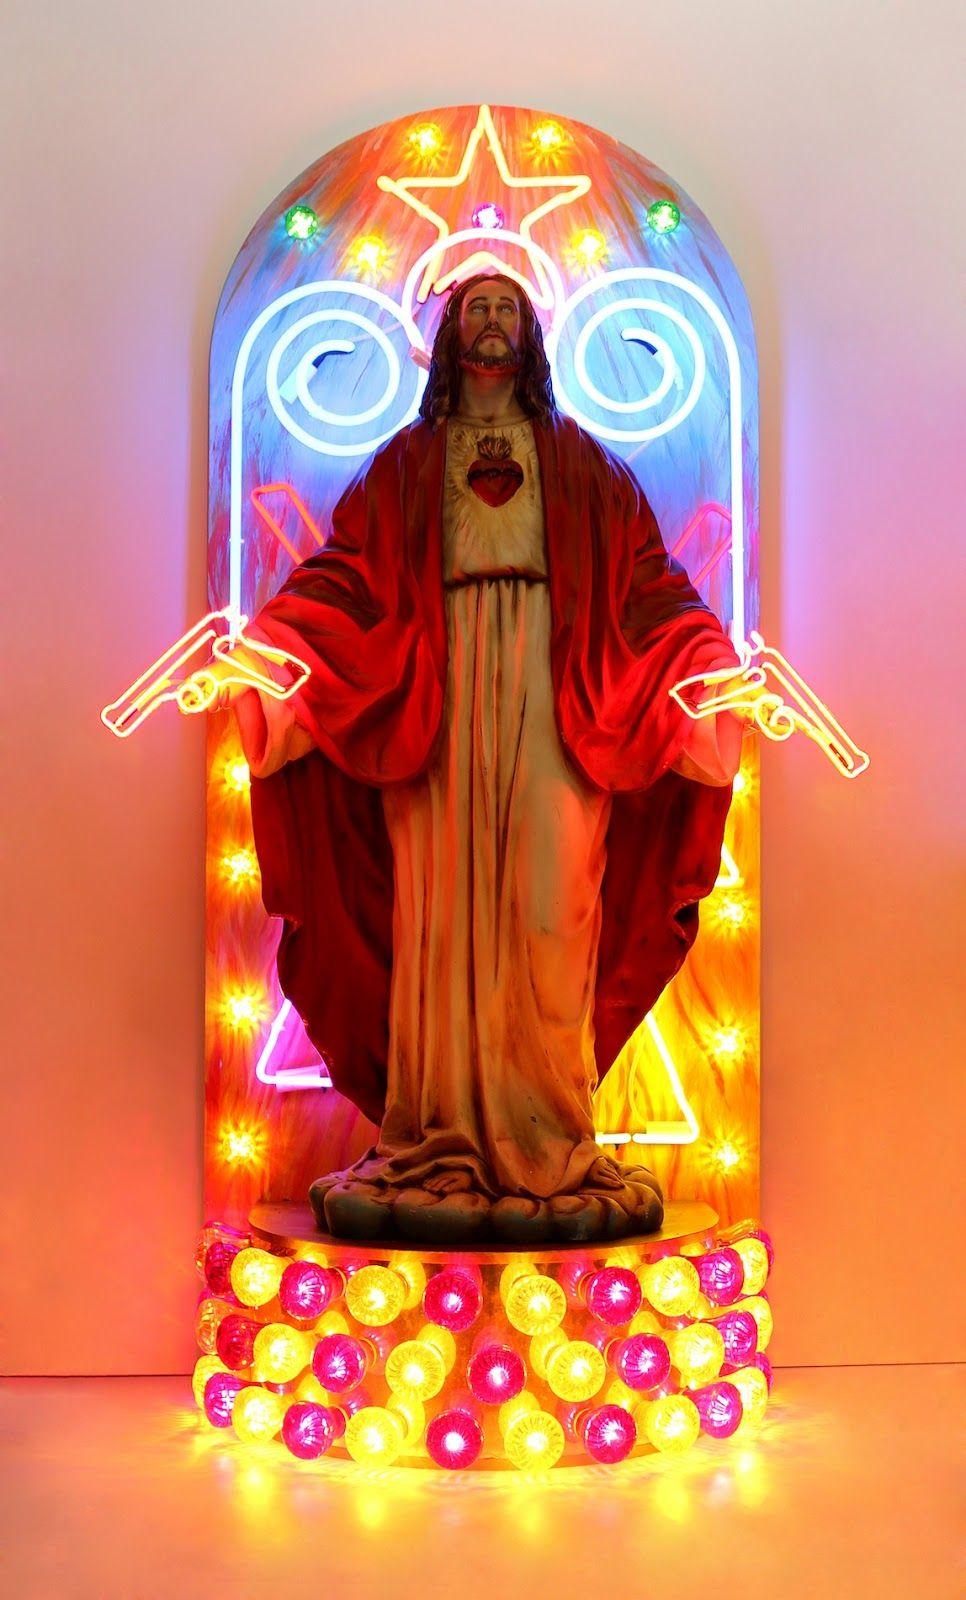 Chris bracey at scream gallery london neon art art